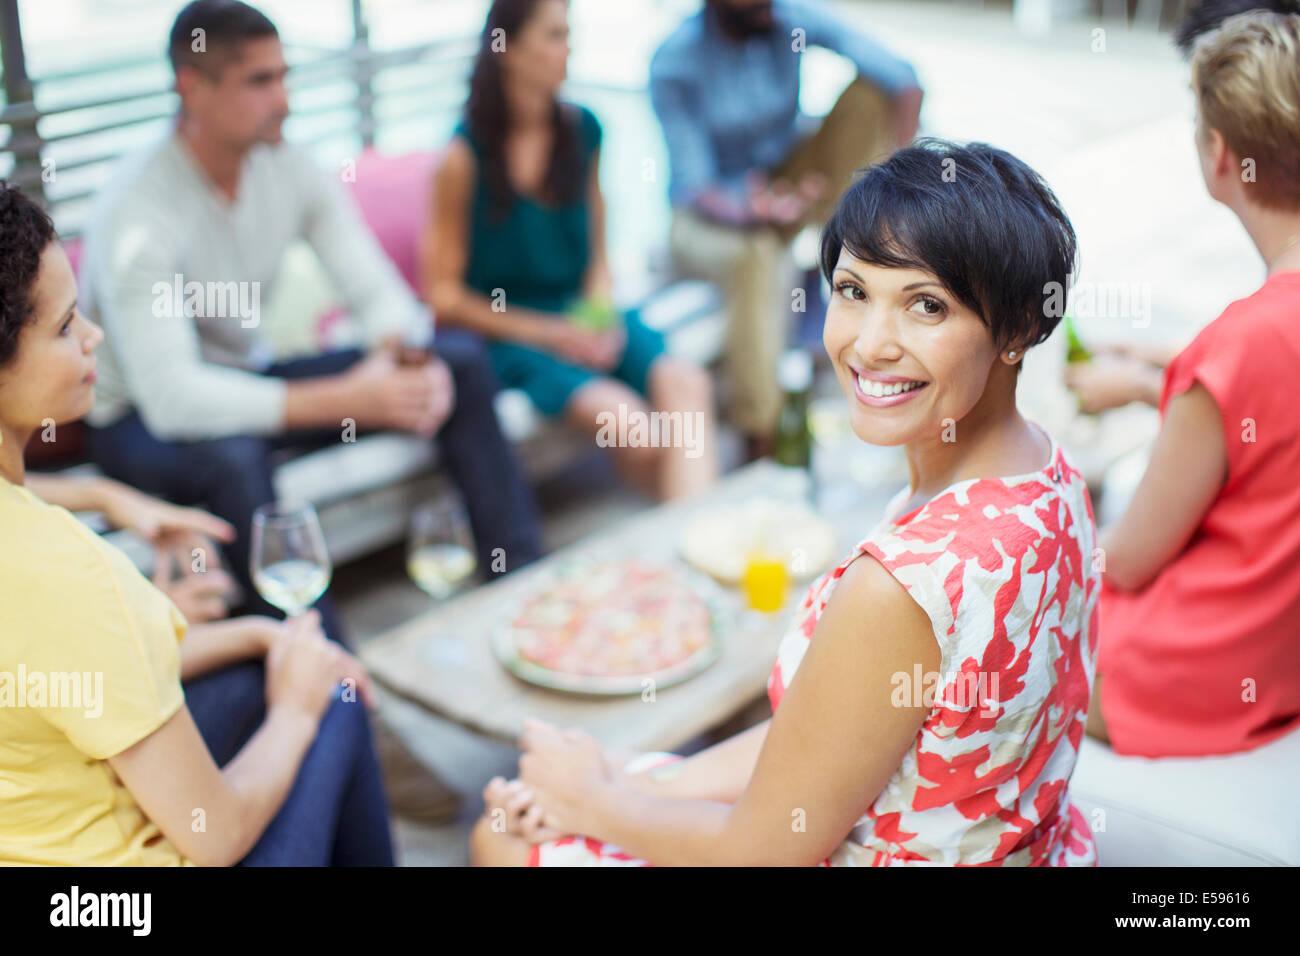 Frau lächelnd auf party Stockbild